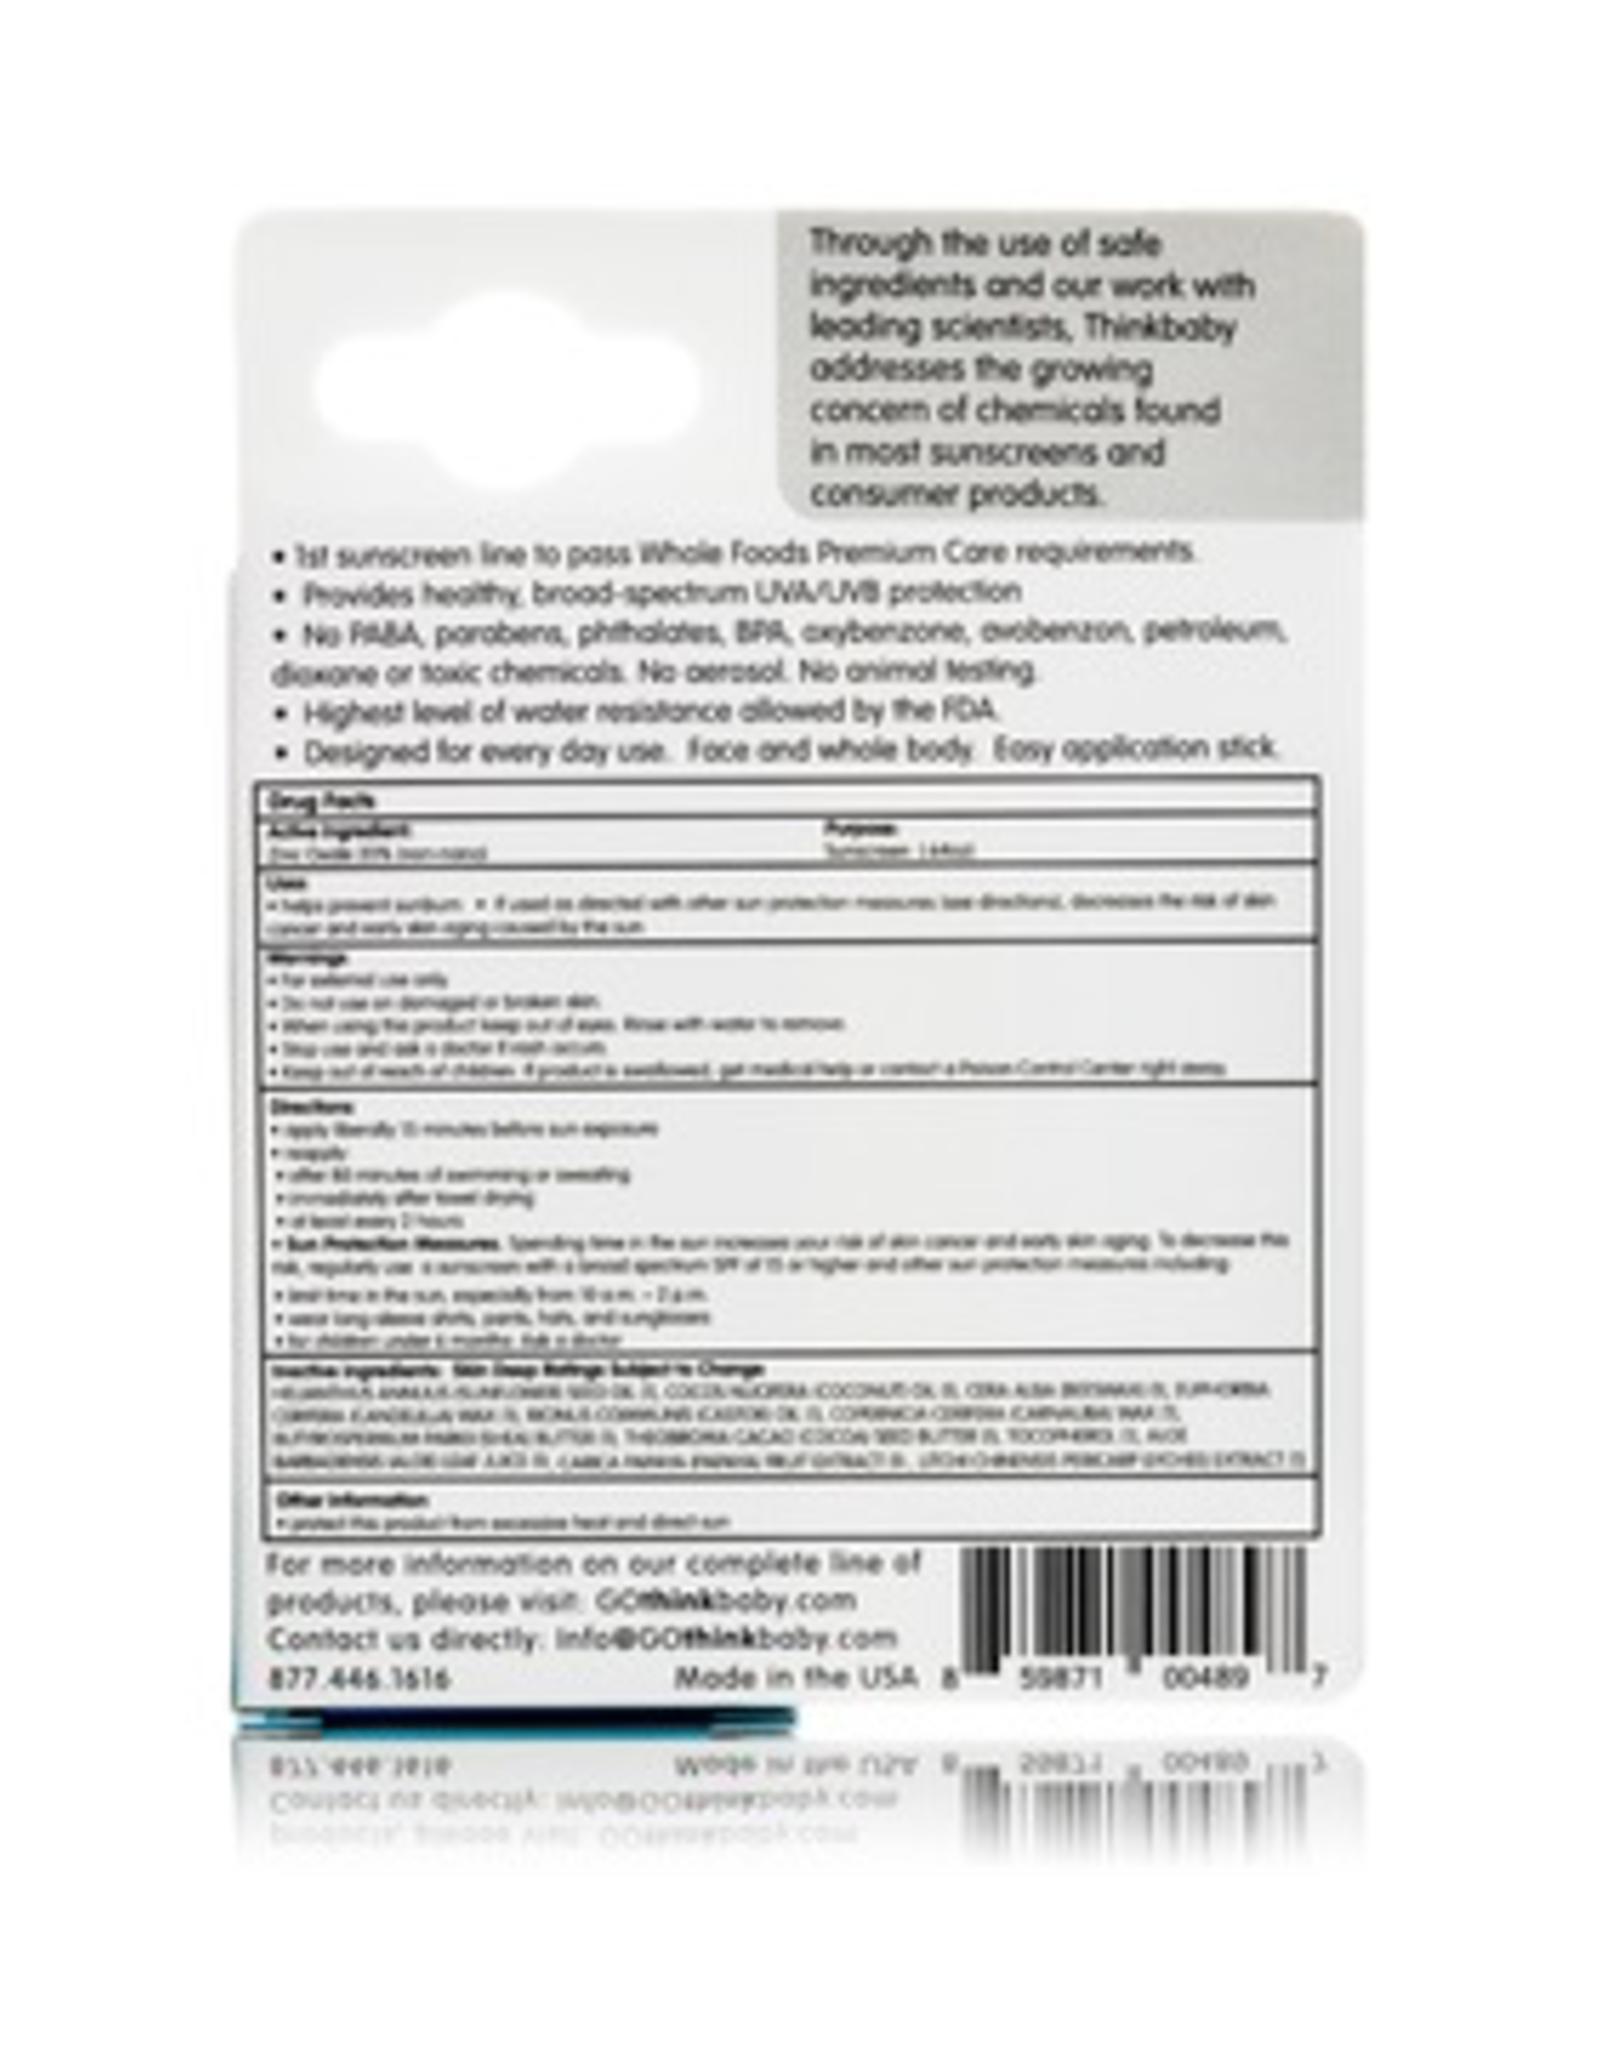 Thinksport Kids Sunscreen Stick SPF 30+ (.64oz/18.4g)